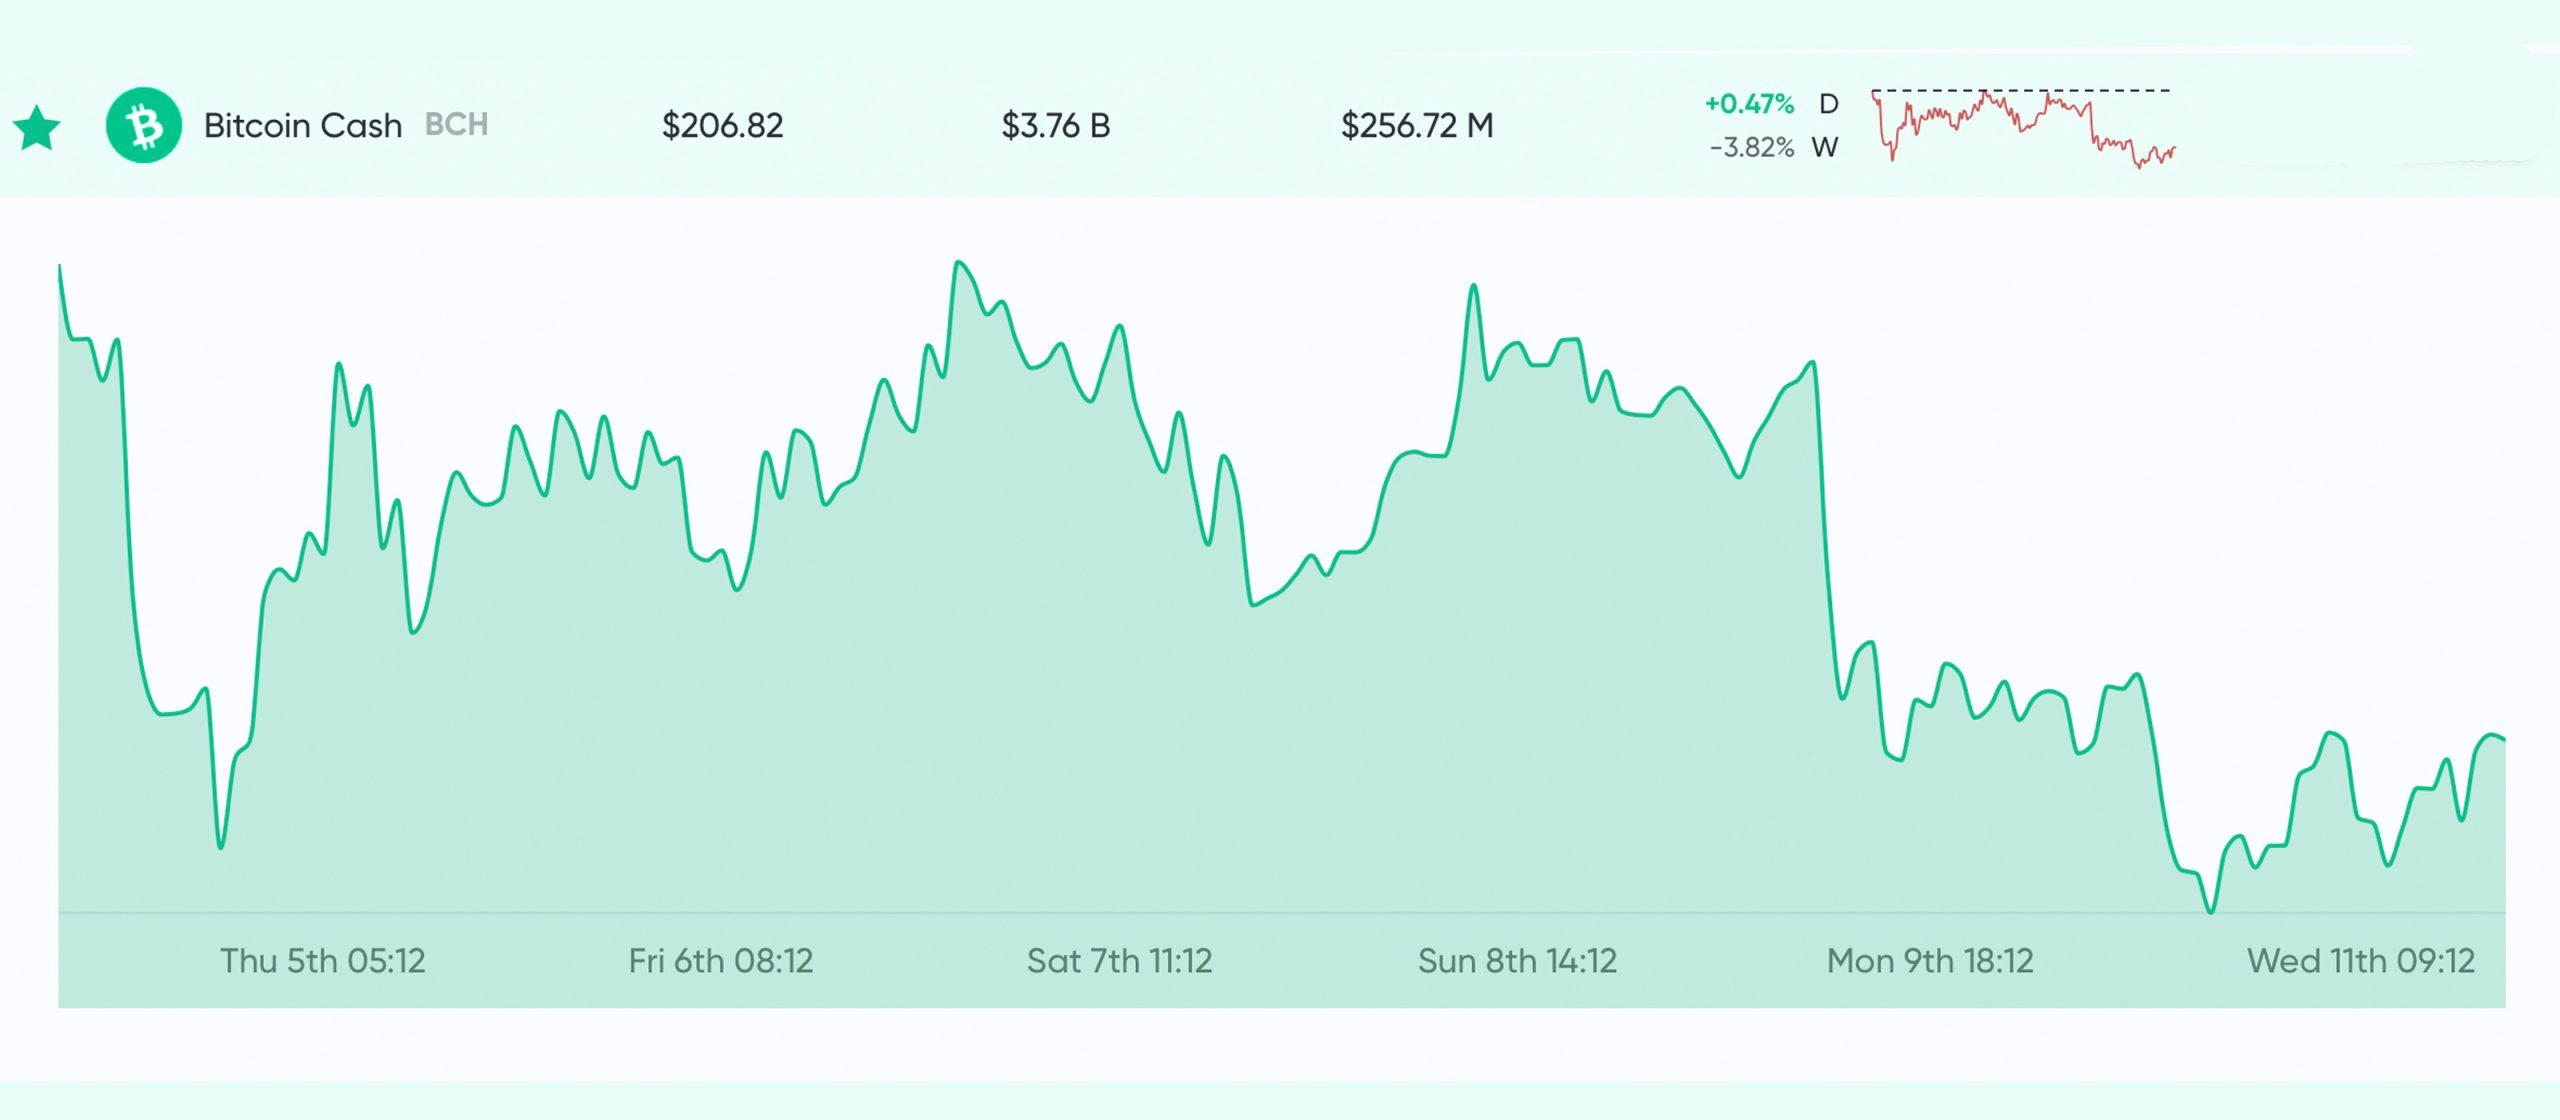 Market Update: Despite Uncertainty, BTC Longs Skyrocket